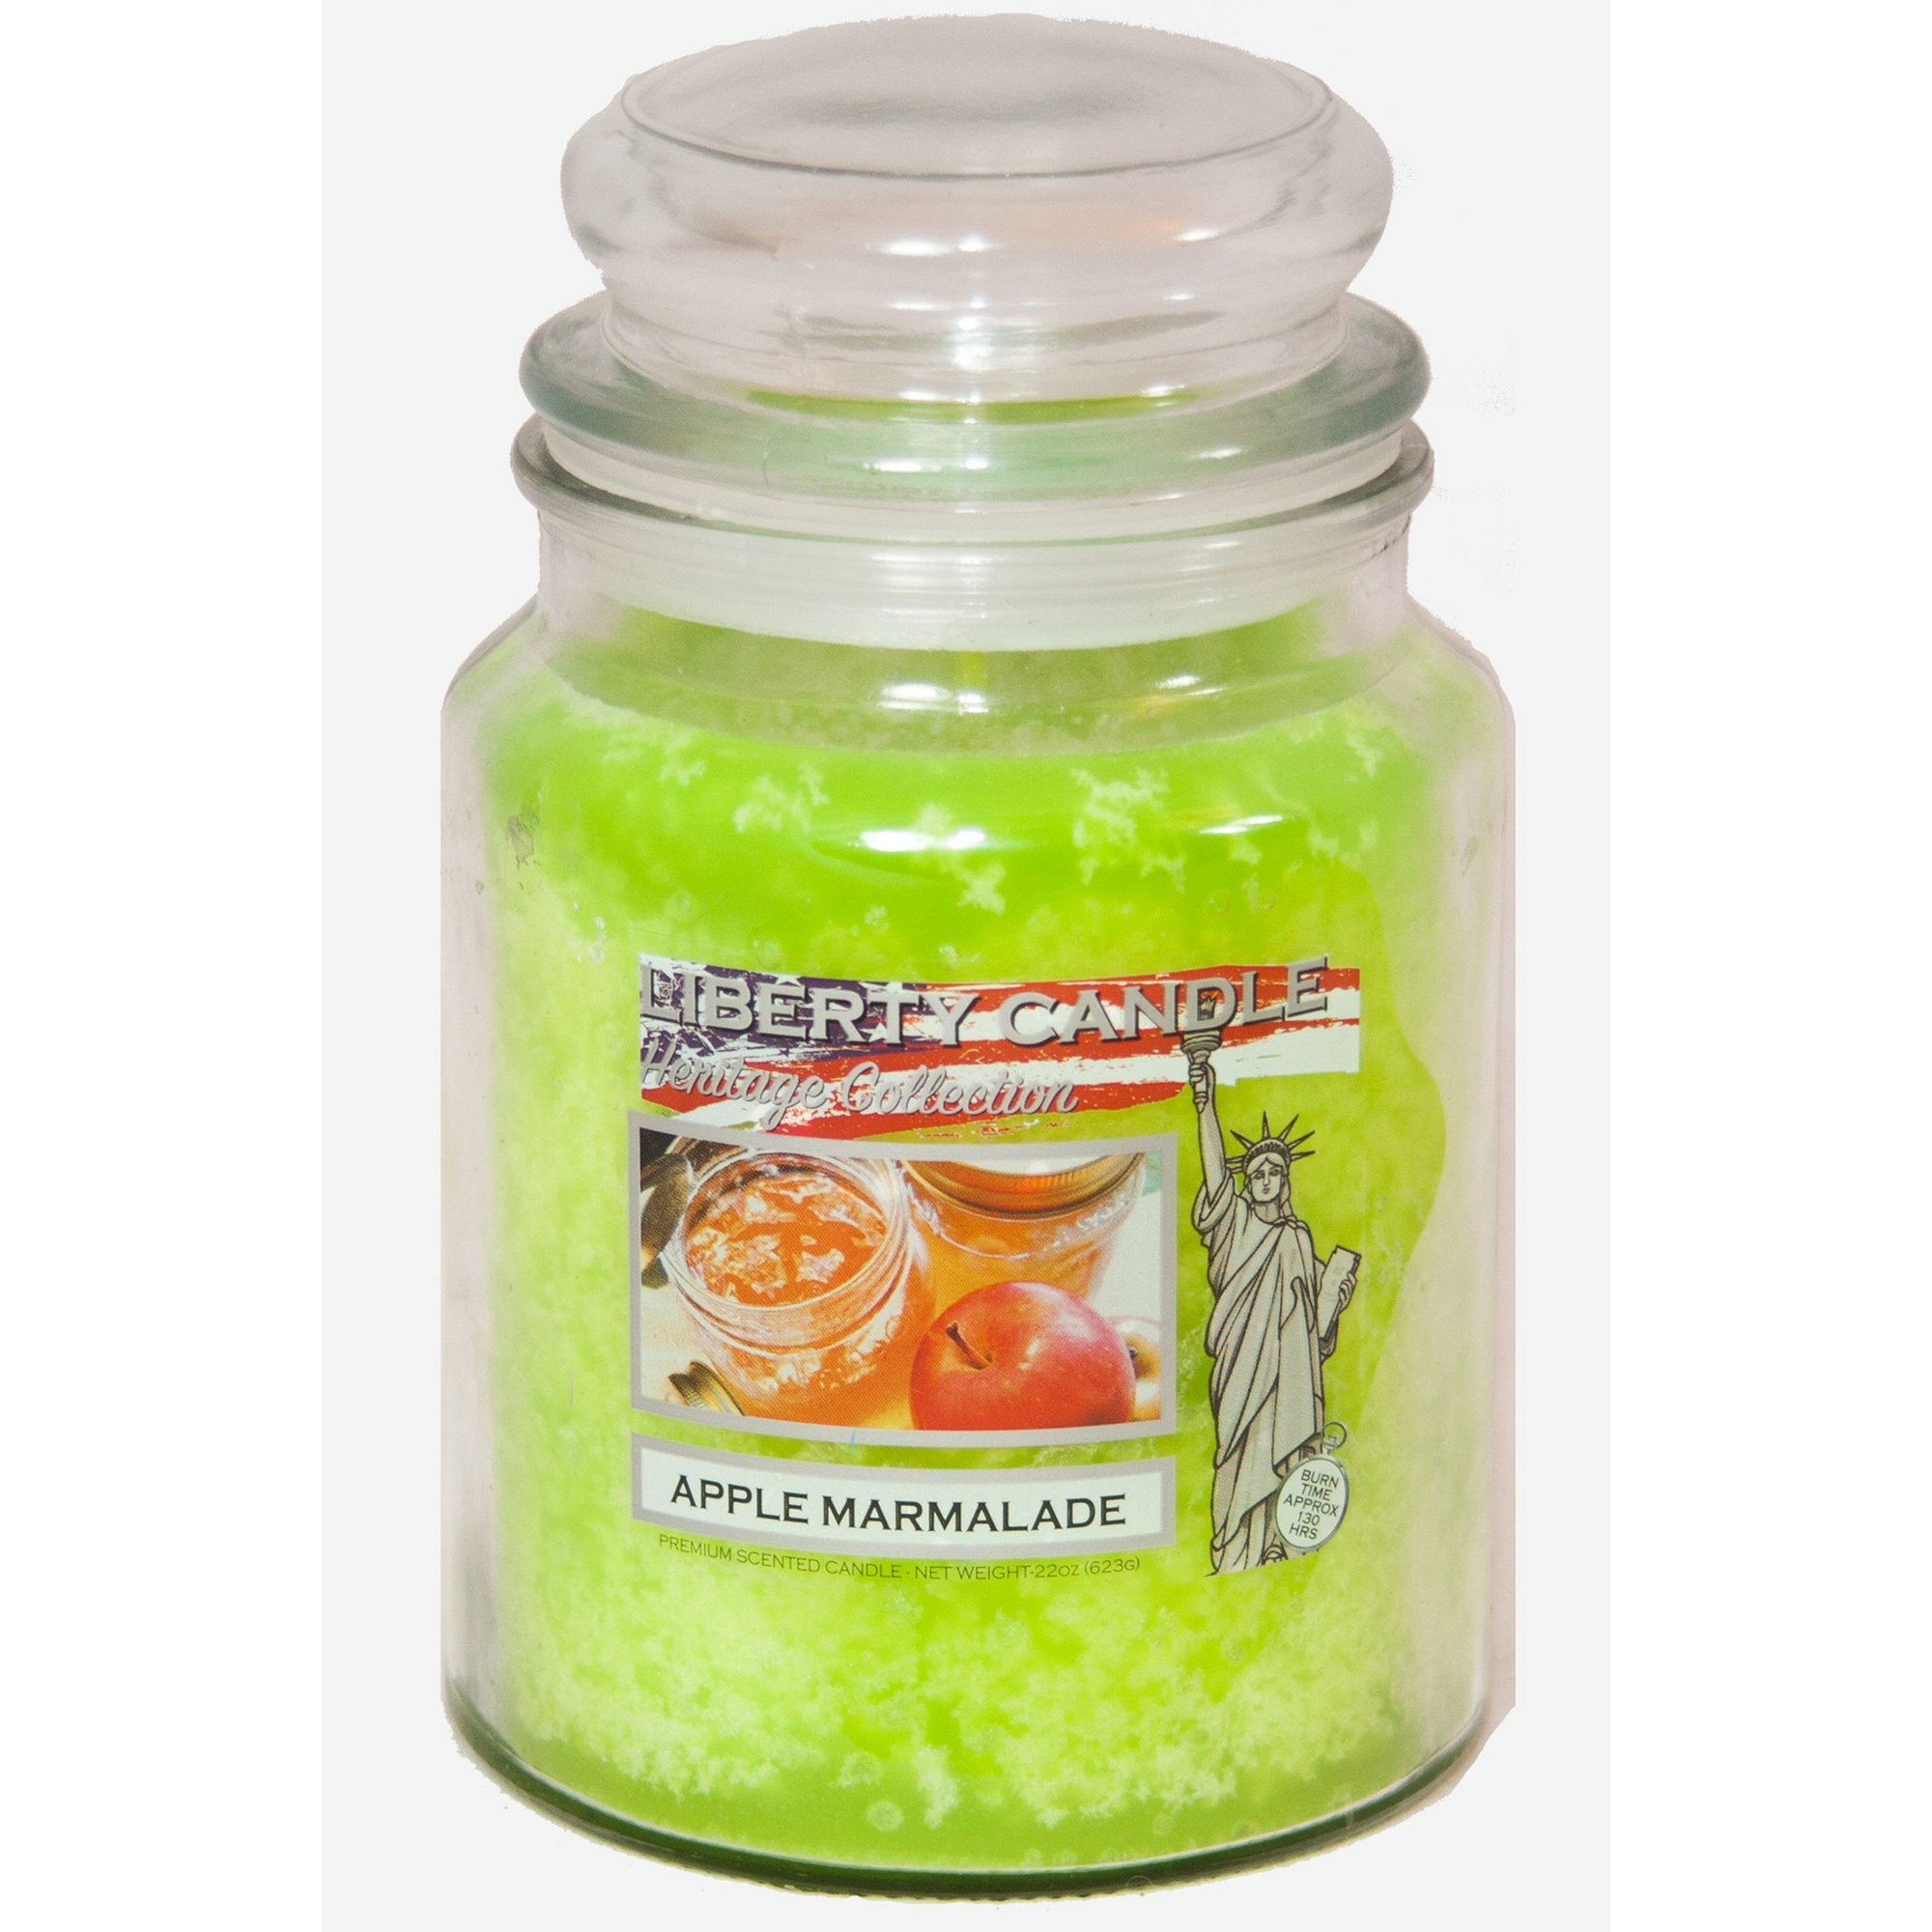 Image of 22oz Glass Jar Candle - Apple Marmalade